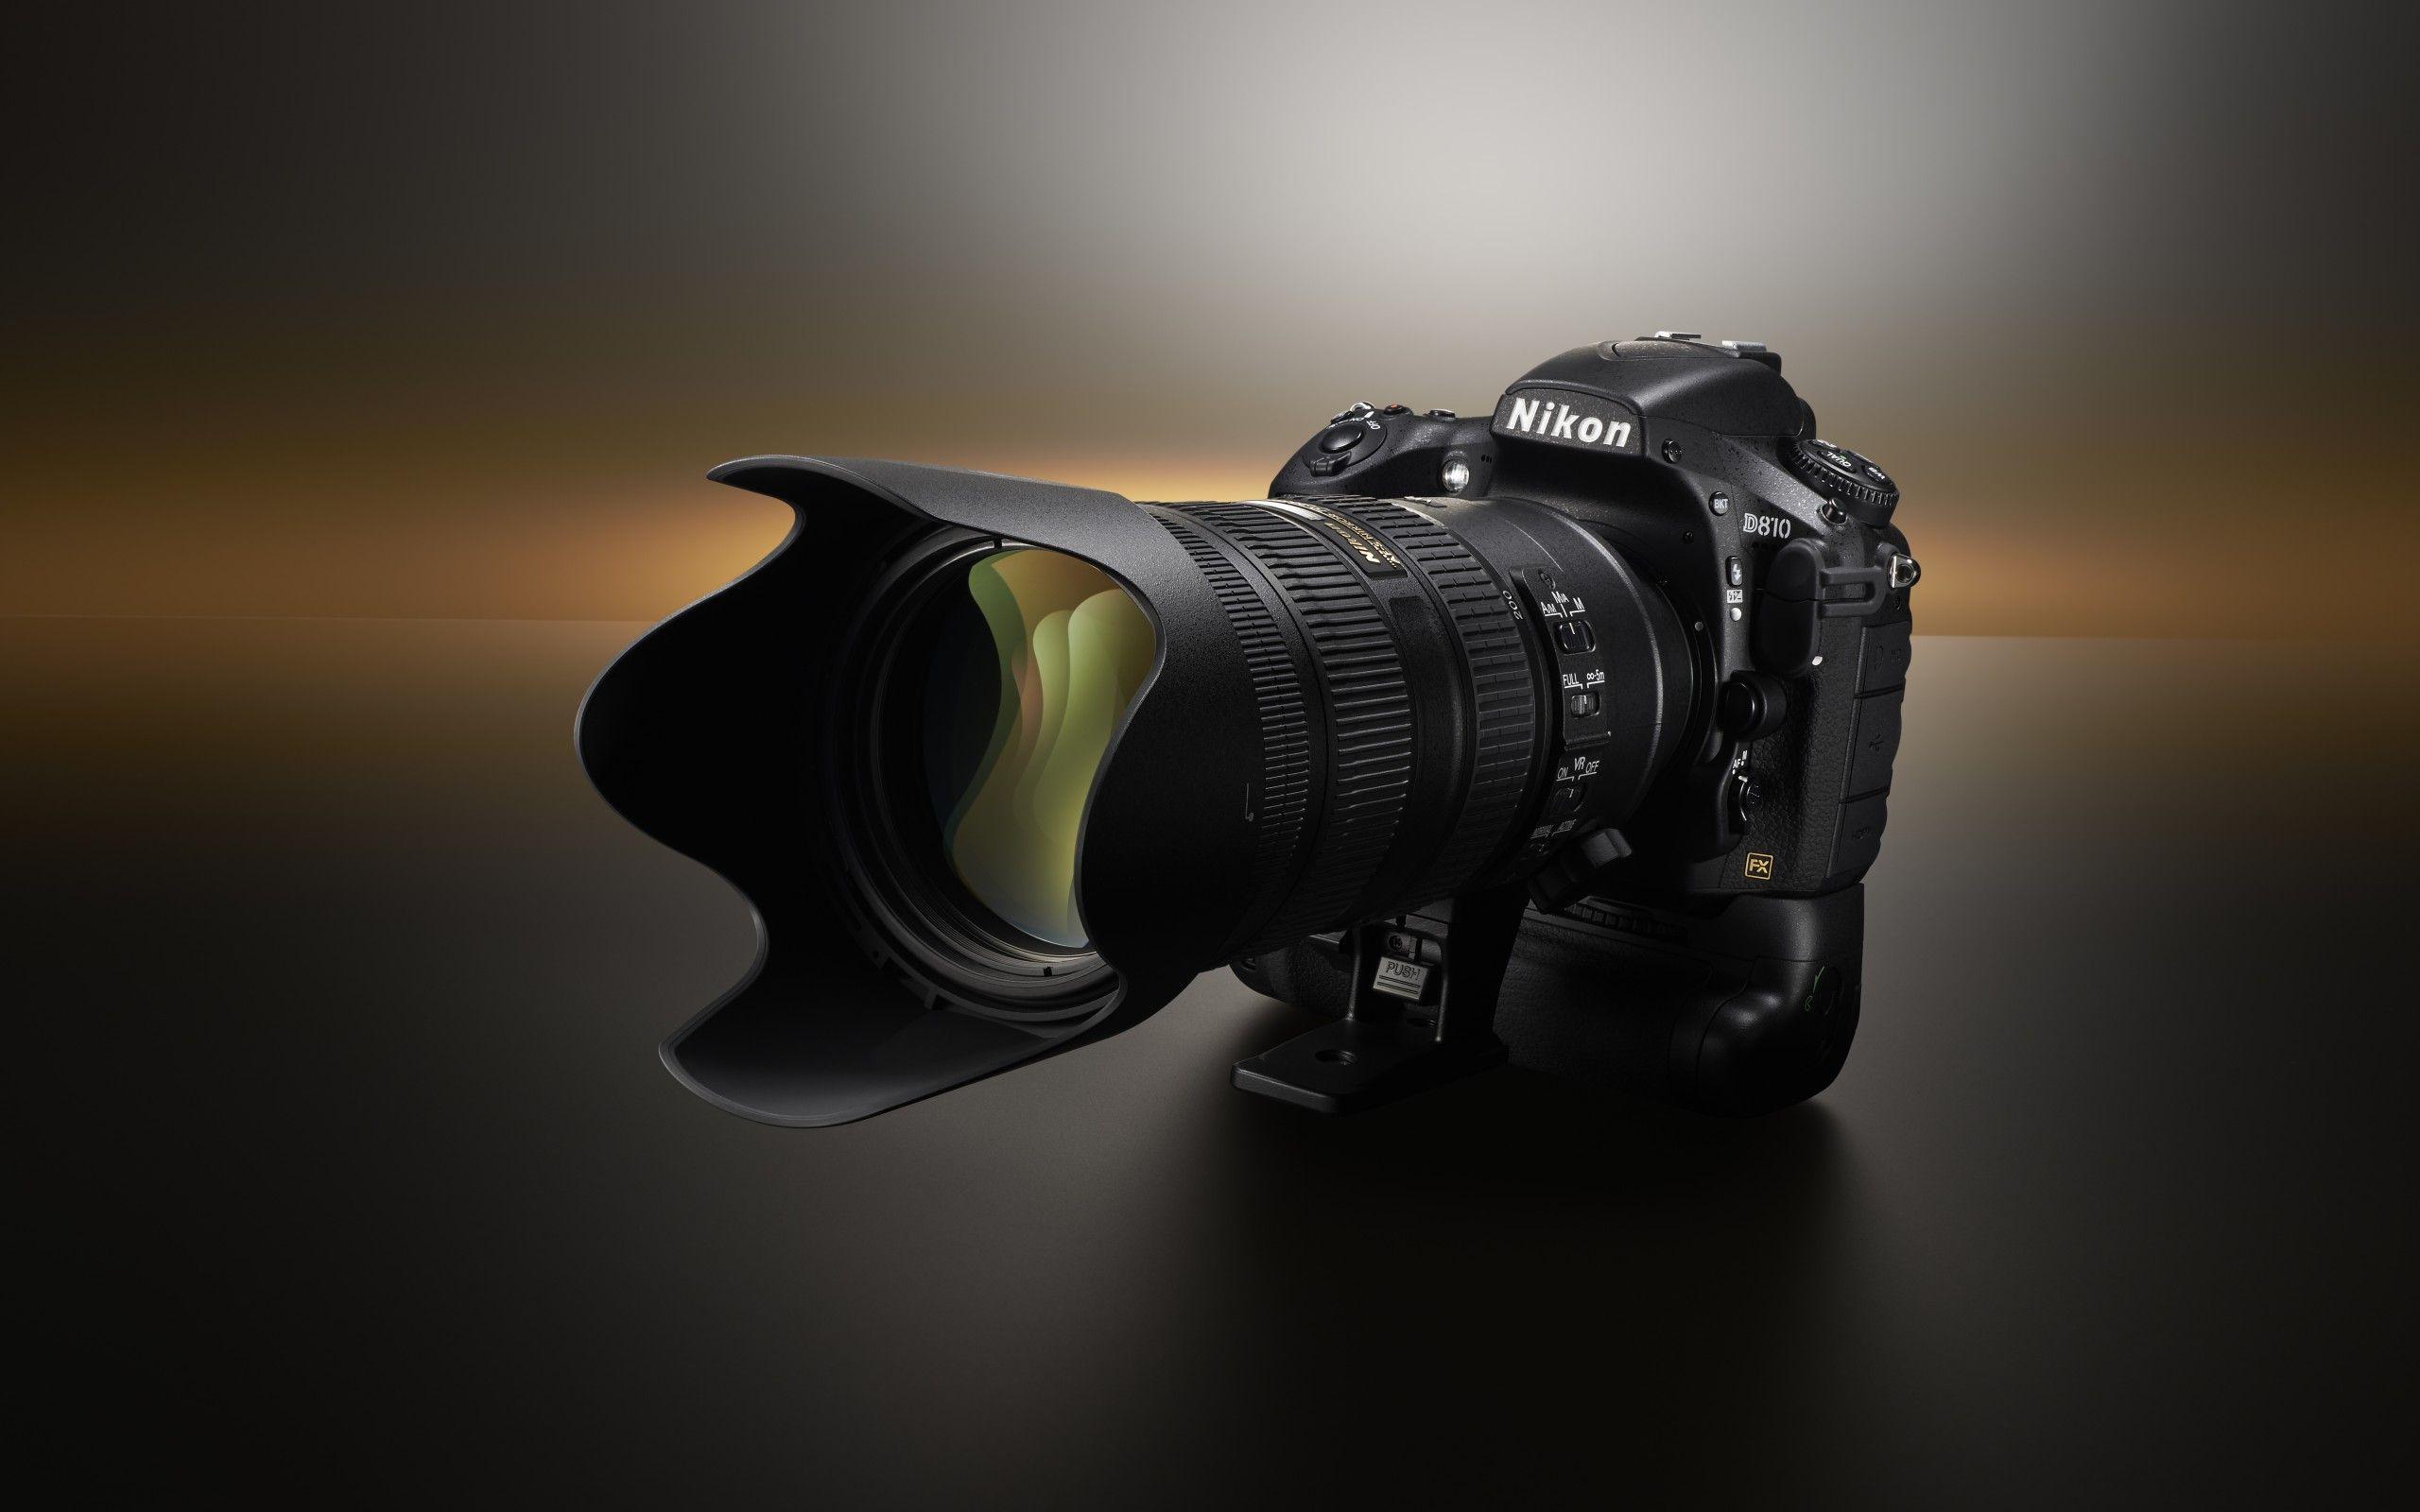 Nikon Wallpaper Hd Wallpapersafari Фотографии